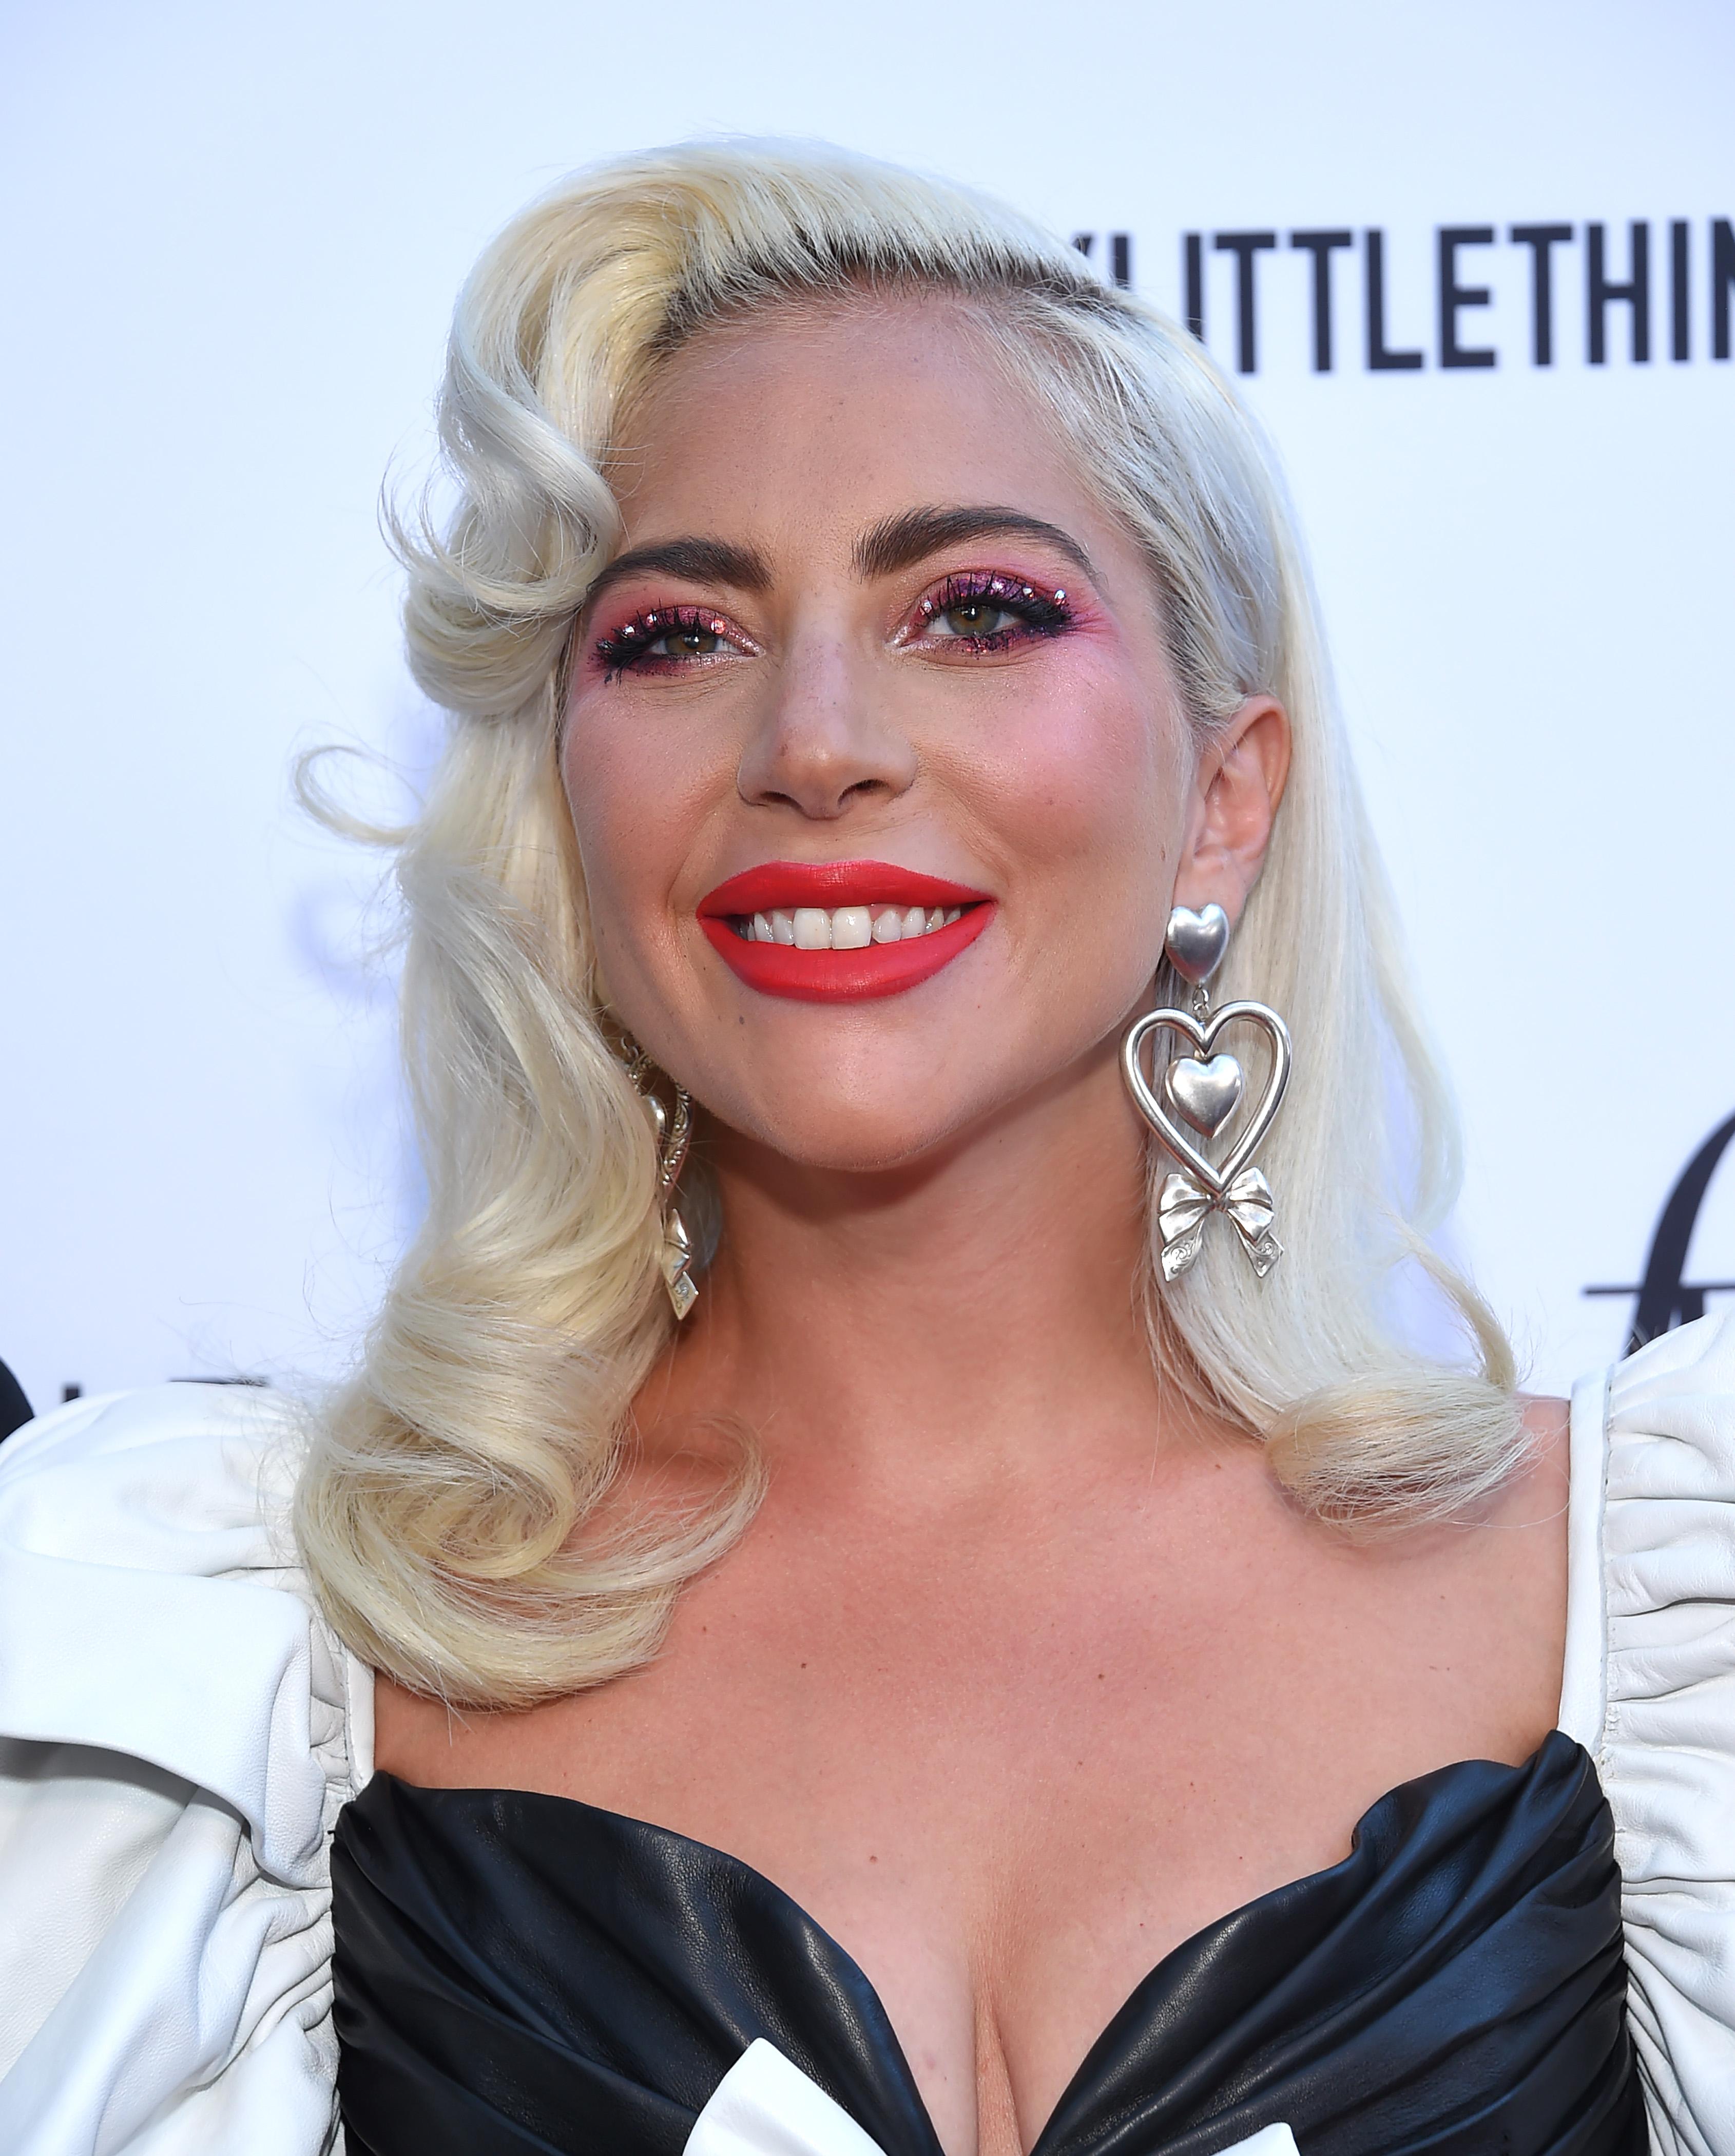 H Lady Gaga κυκλοφορεί νέα παλέτα μακιγιάζ και την ταιριάζει με το… νέο της άλμπουμ!